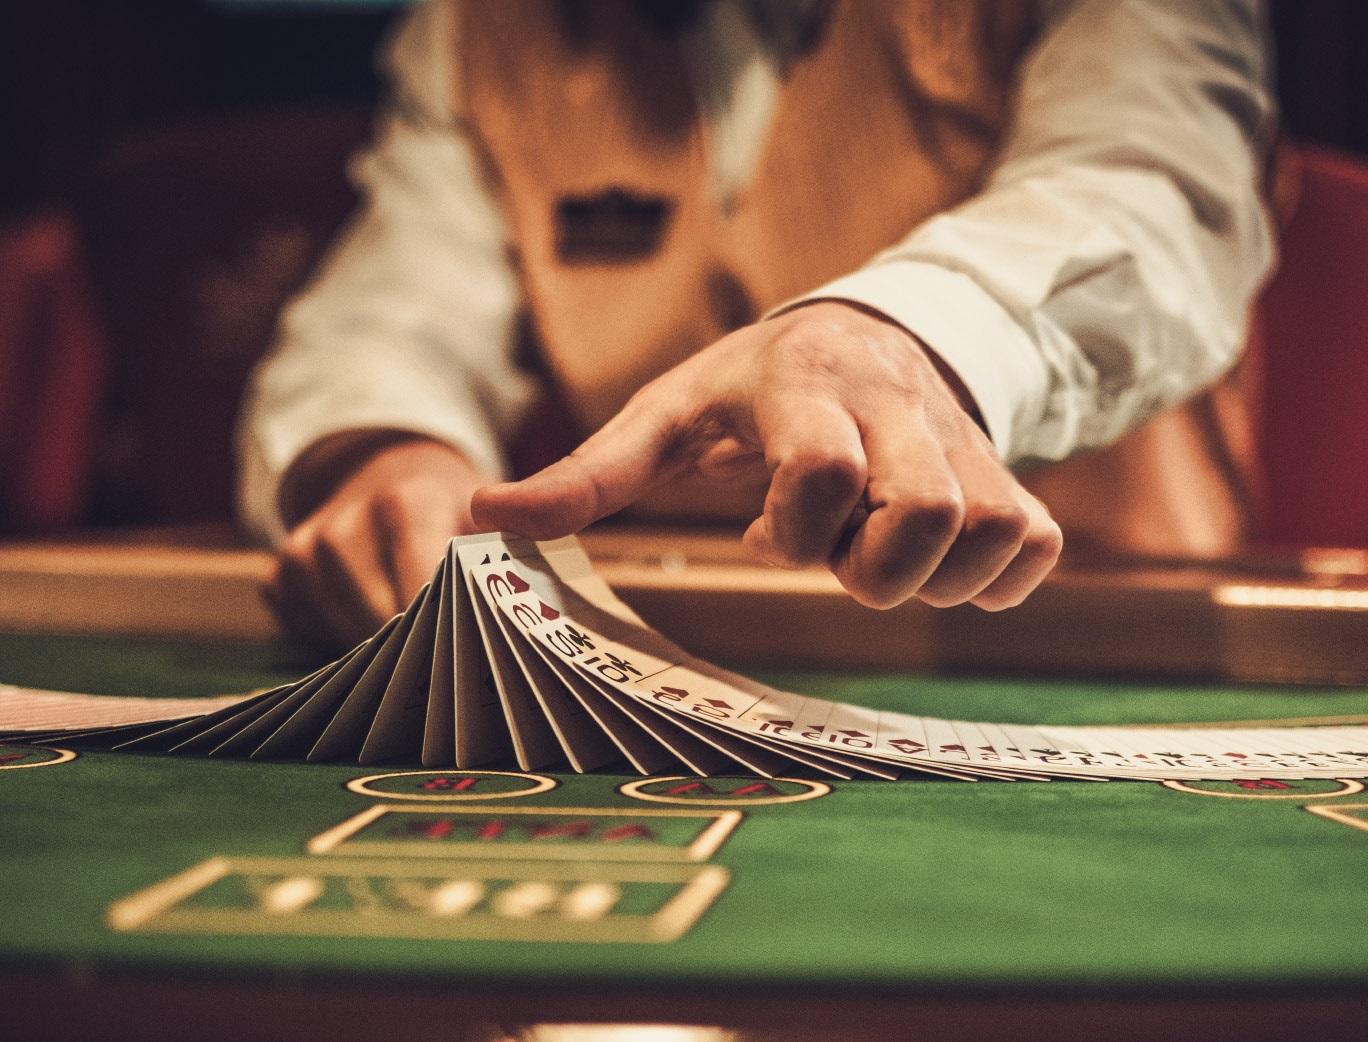 Langkah Main Poker Online Agar Menang Terus